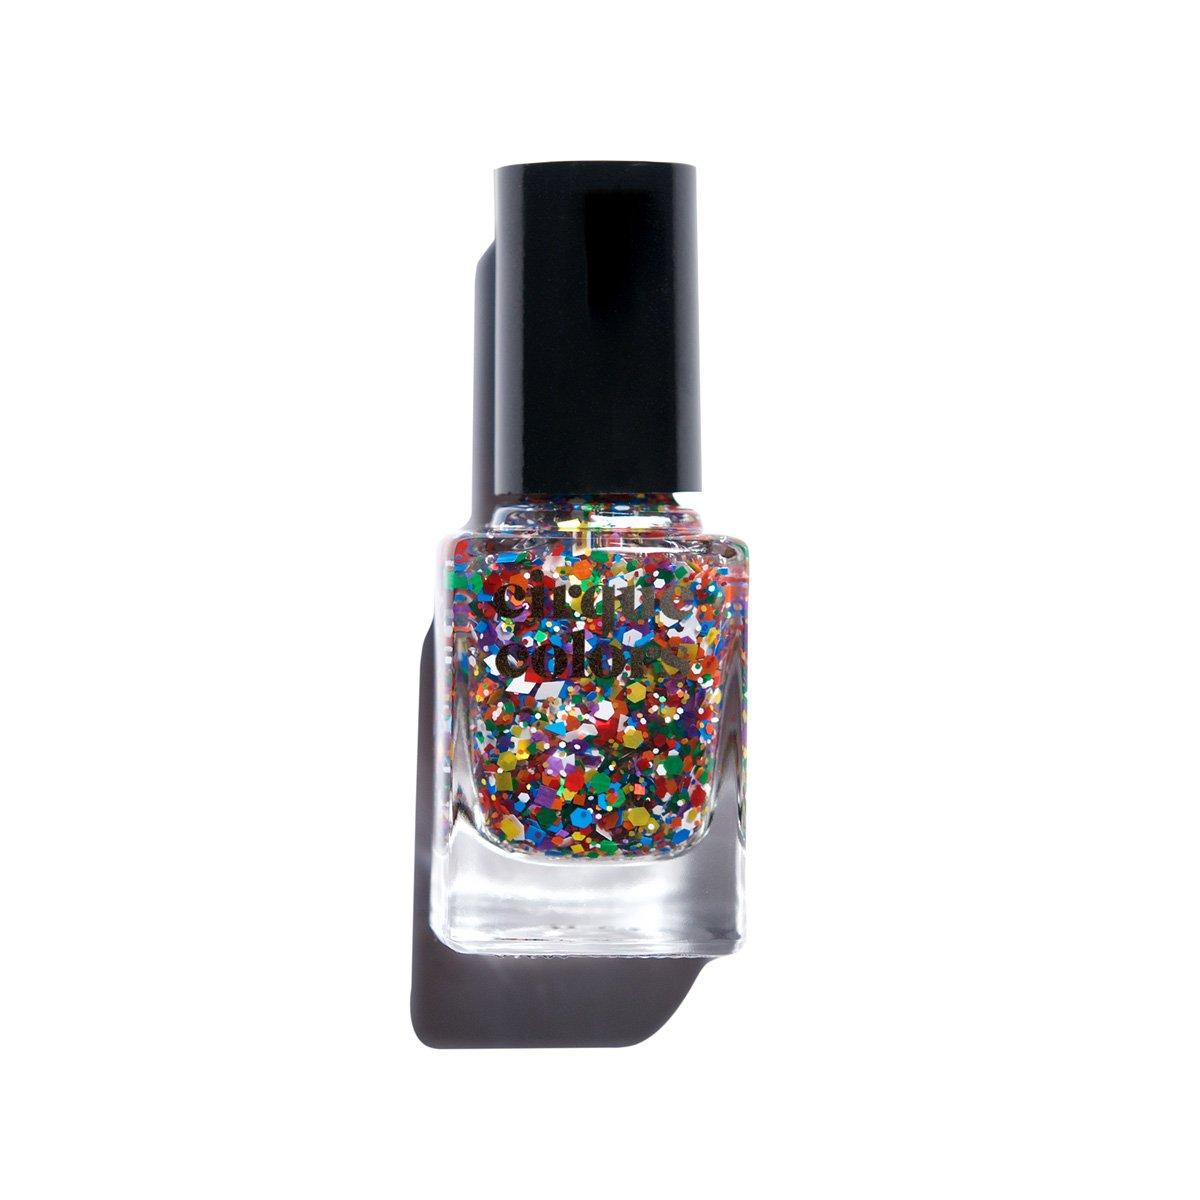 Cirque Colors Glitter Nail Polish - 0.37 fl. oz. (11 ml) - Vegan, Cruelty-Free, Non-Toxic Formula (Kaleidoscope)